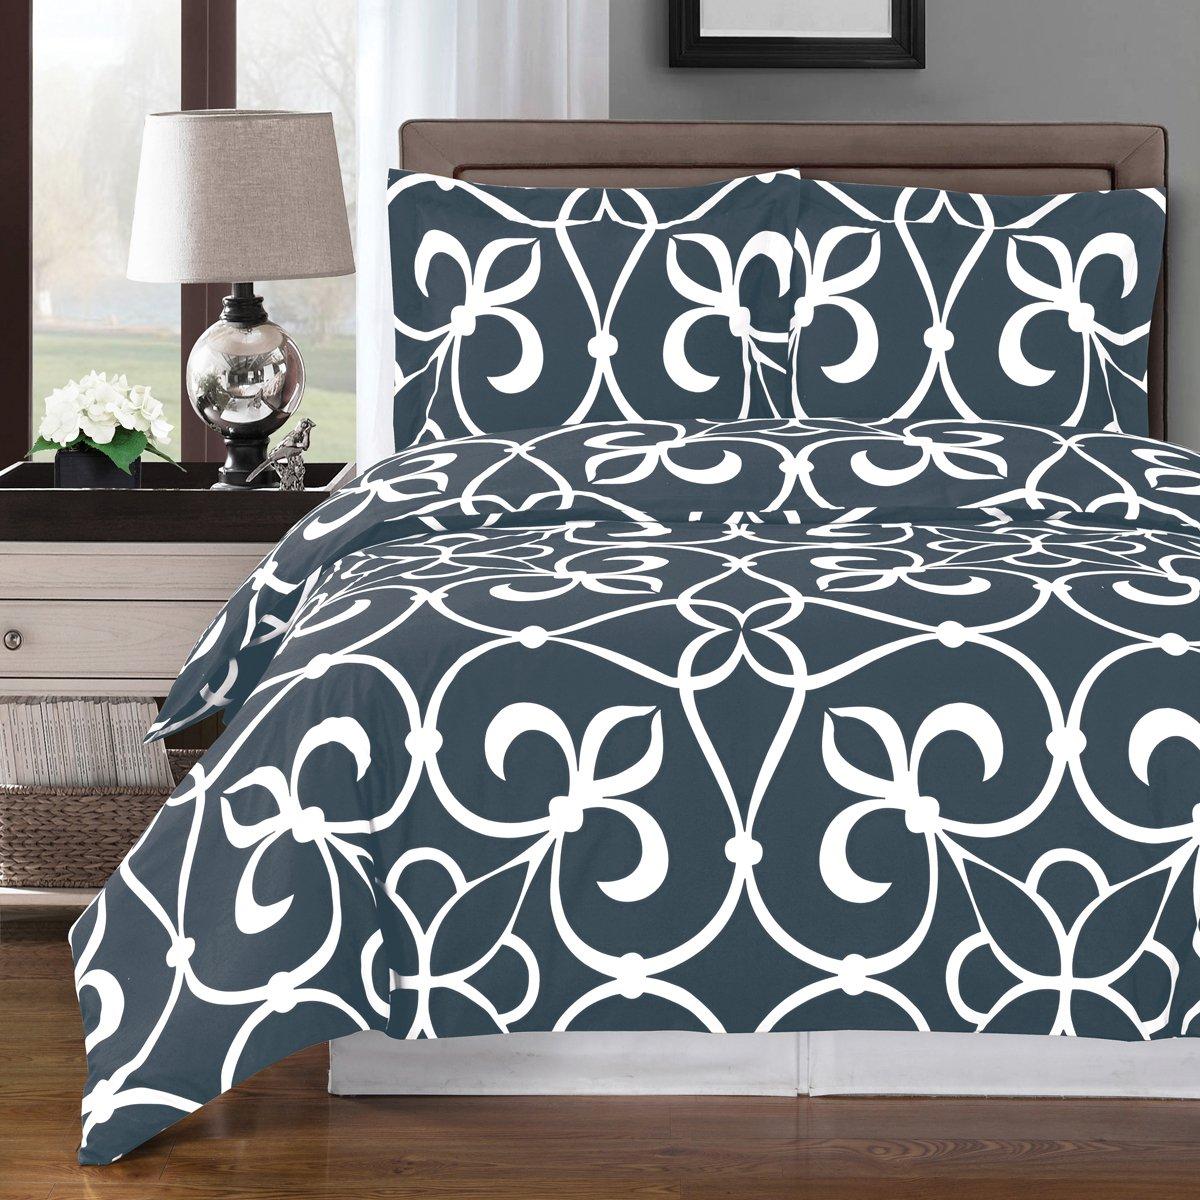 8pcs King size Bed in a bag Printed duvet set Including Cotton Victoria/Grey 3pcs Duvet cover set+ 4pcs King sheet set+ 1pc King/CalKing Down Alternative comforter